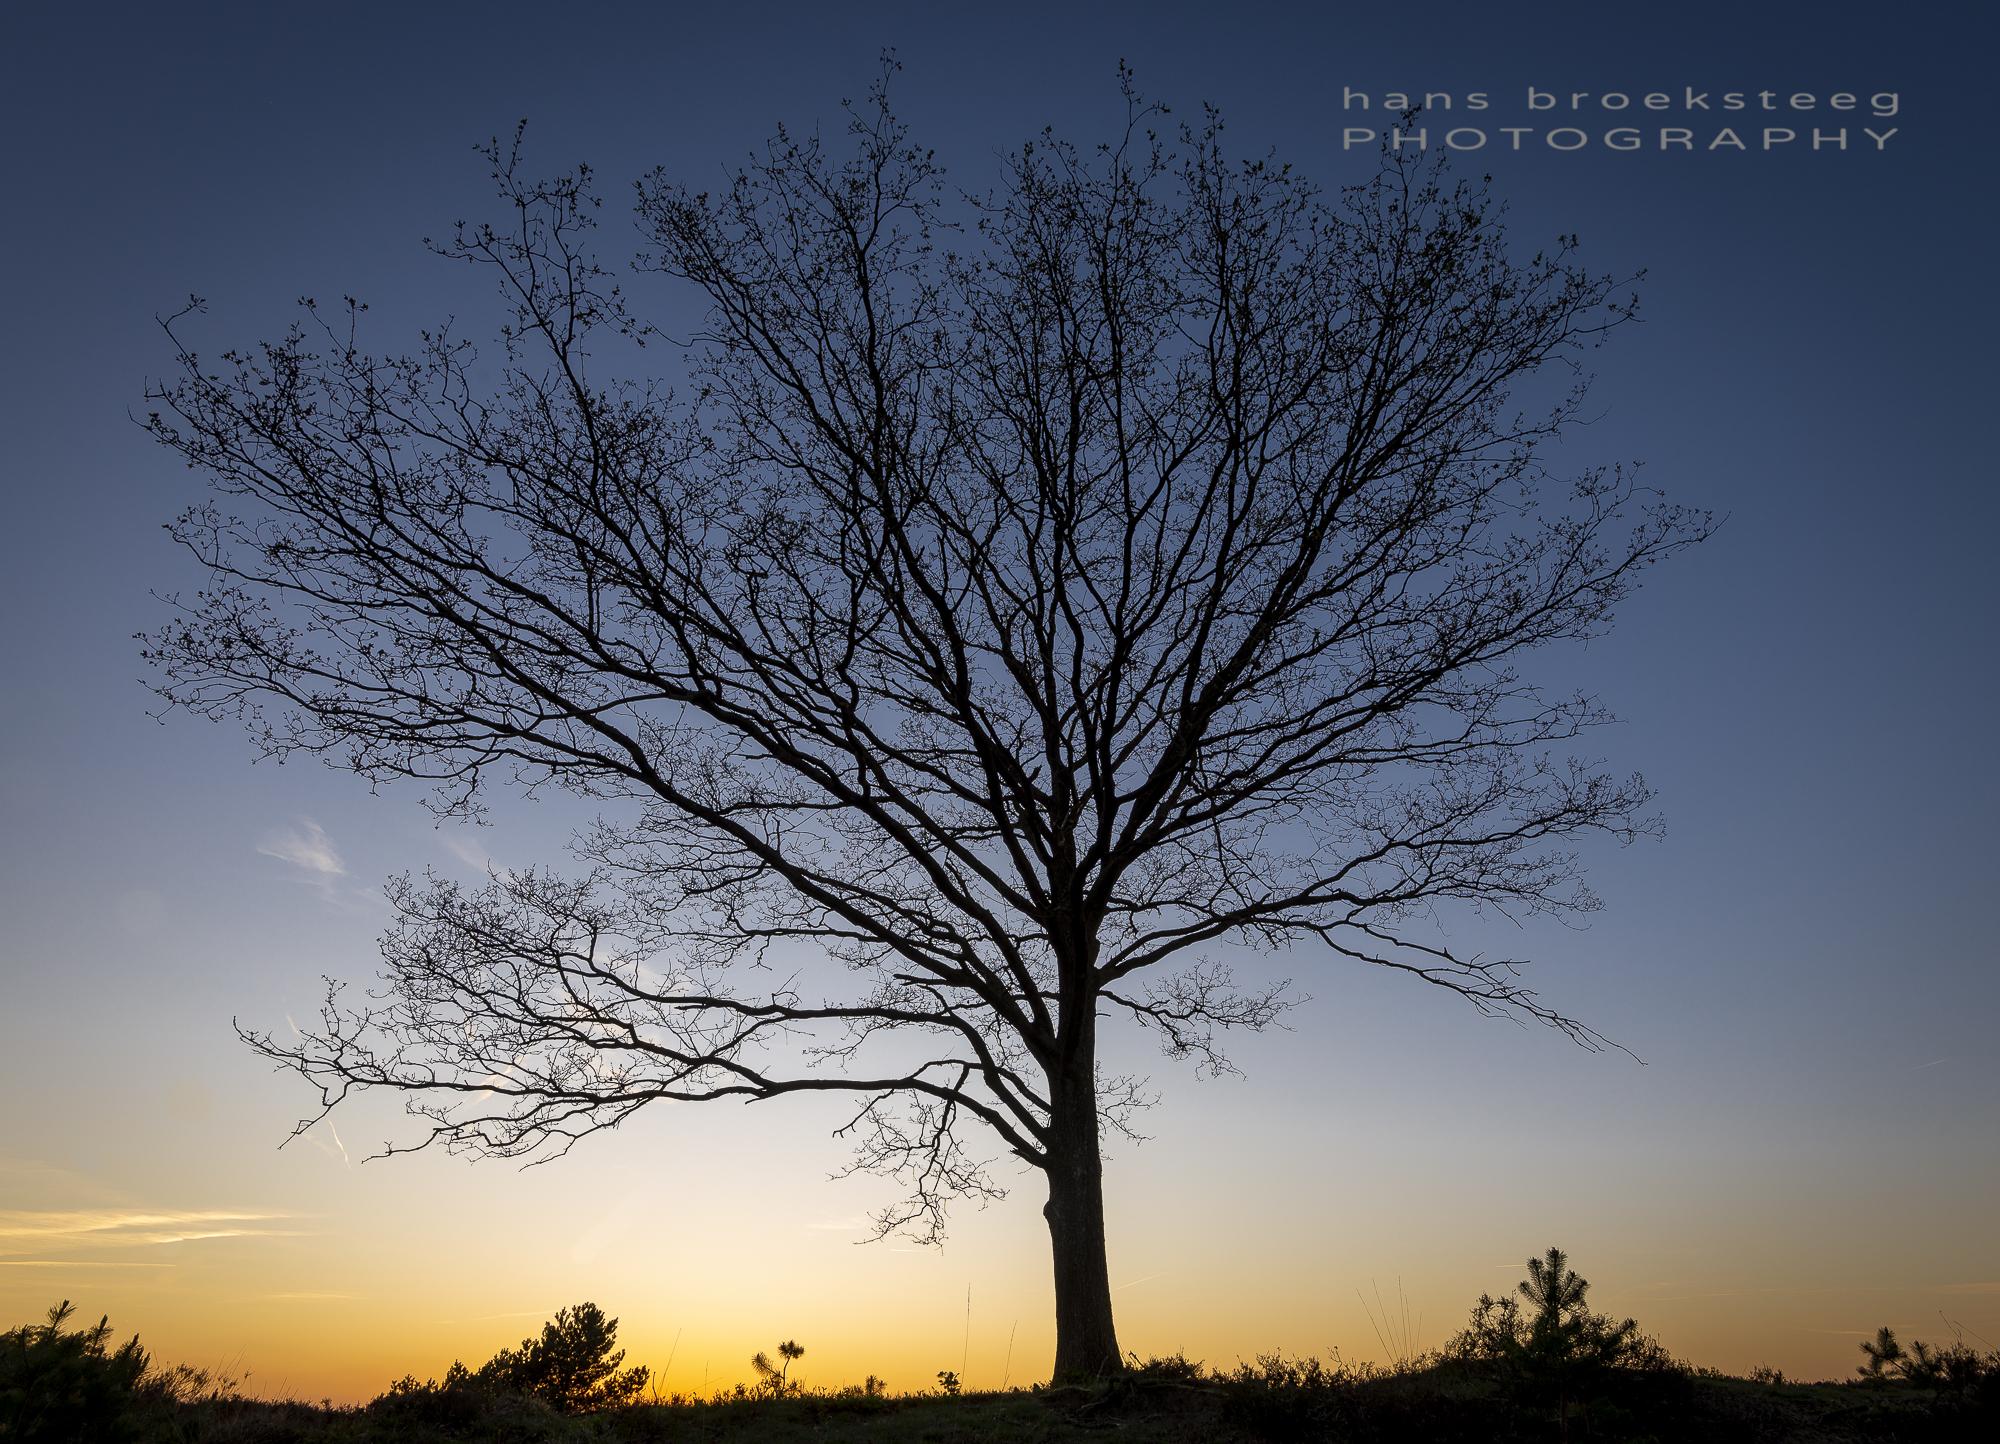 Solitair tree